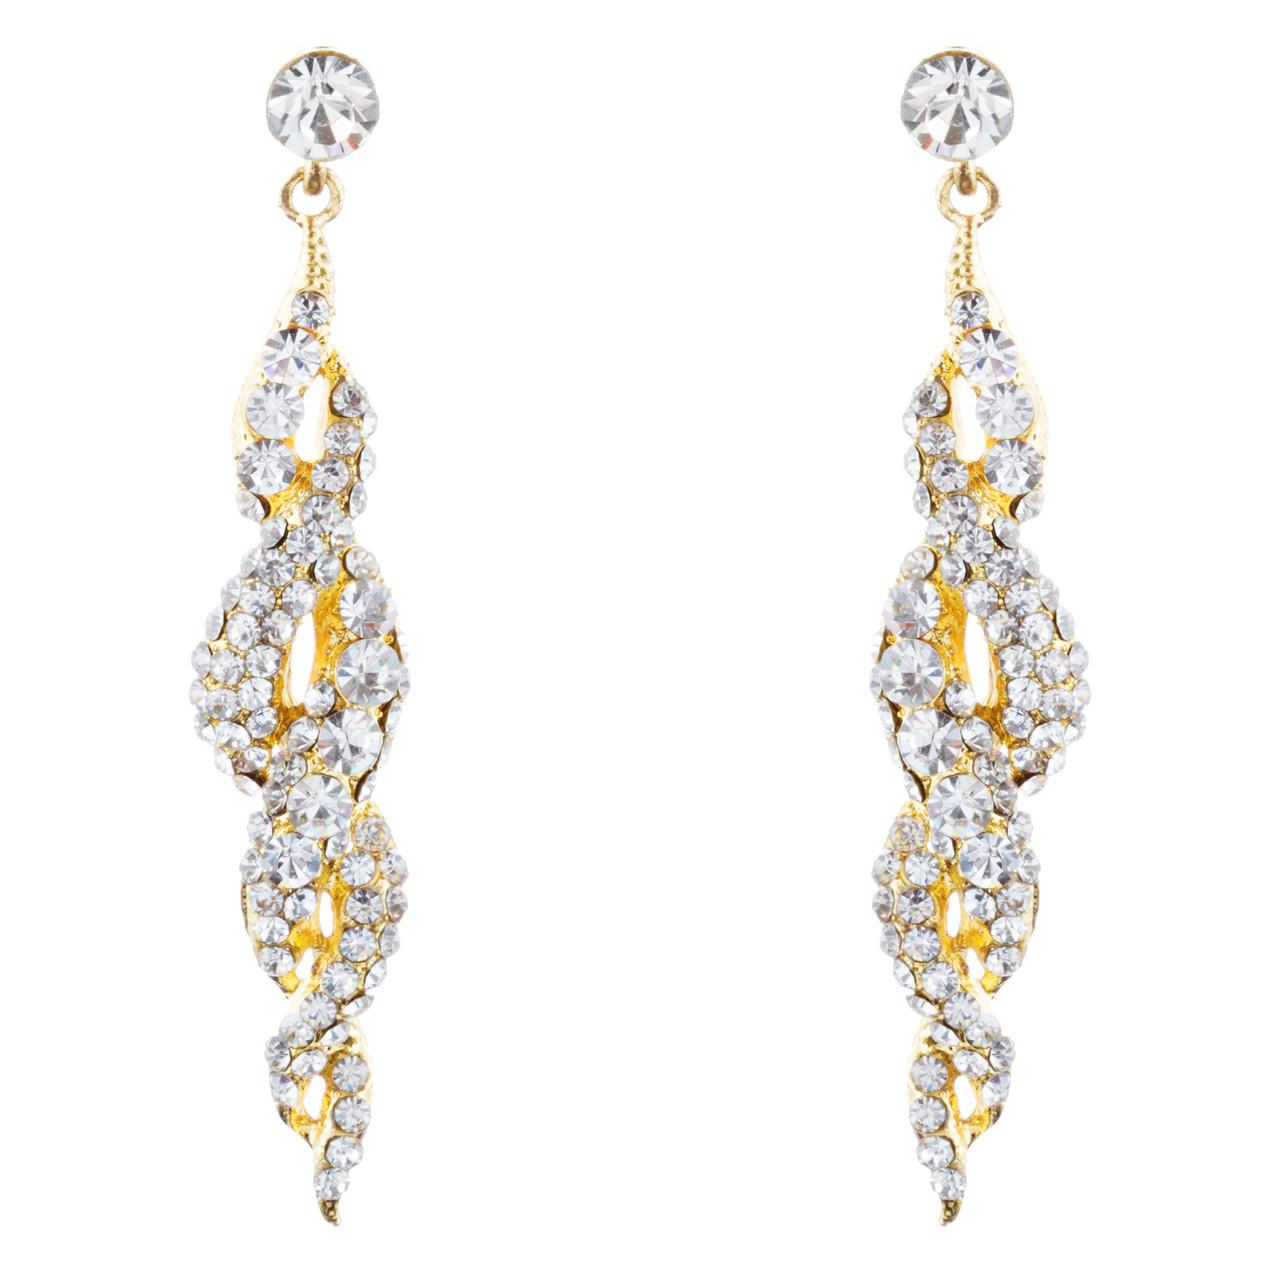 be7204c42c174 Bridal Wedding Jewelry Prom Crystal Rhinestone Classy Dangle Earrings E973  Gold